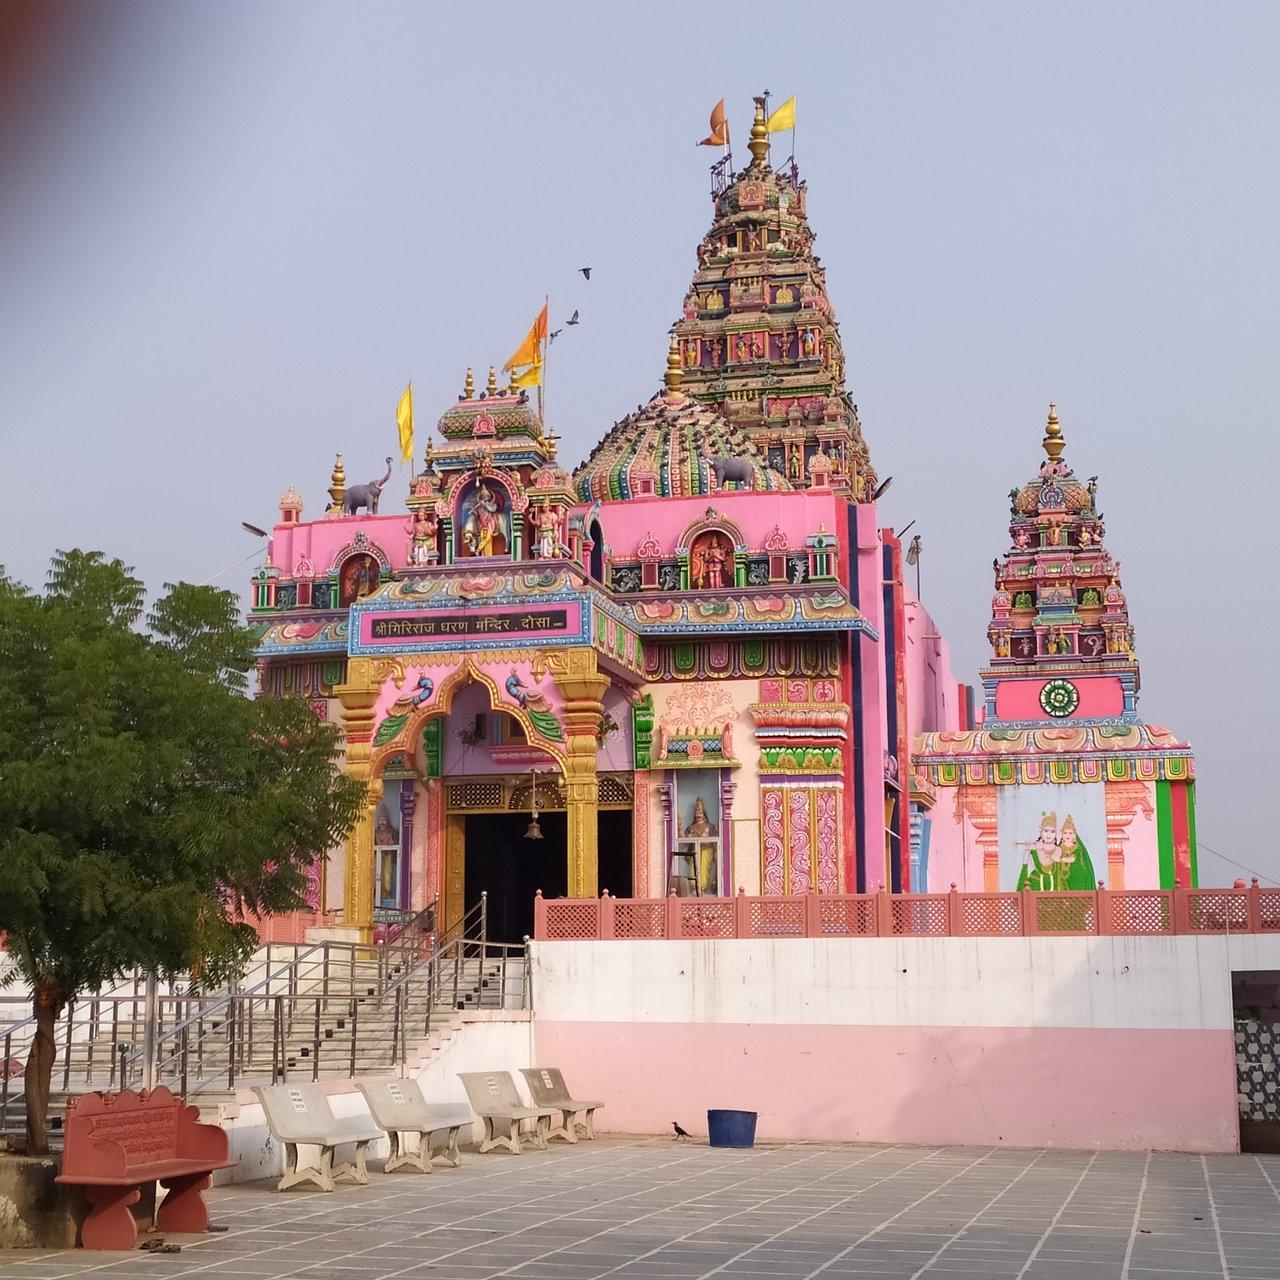 PunjabKesari, Mehndipur bala ji, मेंहदीपुर बाला जी मंदिर, Mehndipur bala ji temple, Rajasthan Mehndipur bala ji temple, Dharmik Sthal, Religious Place in india, hindu teerth Sthal